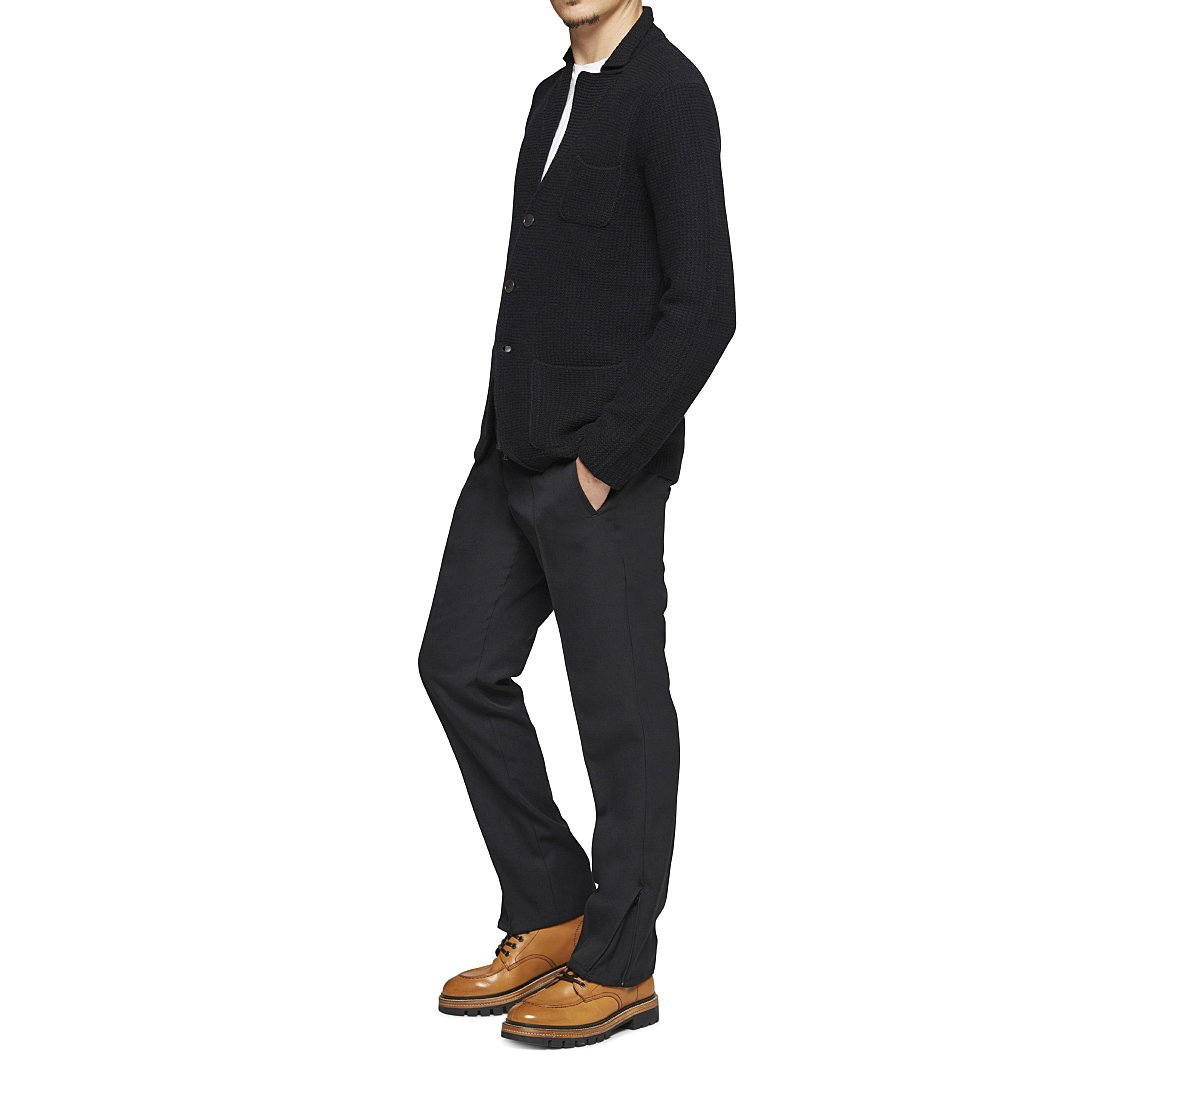 Cardigan stile blazer in lana